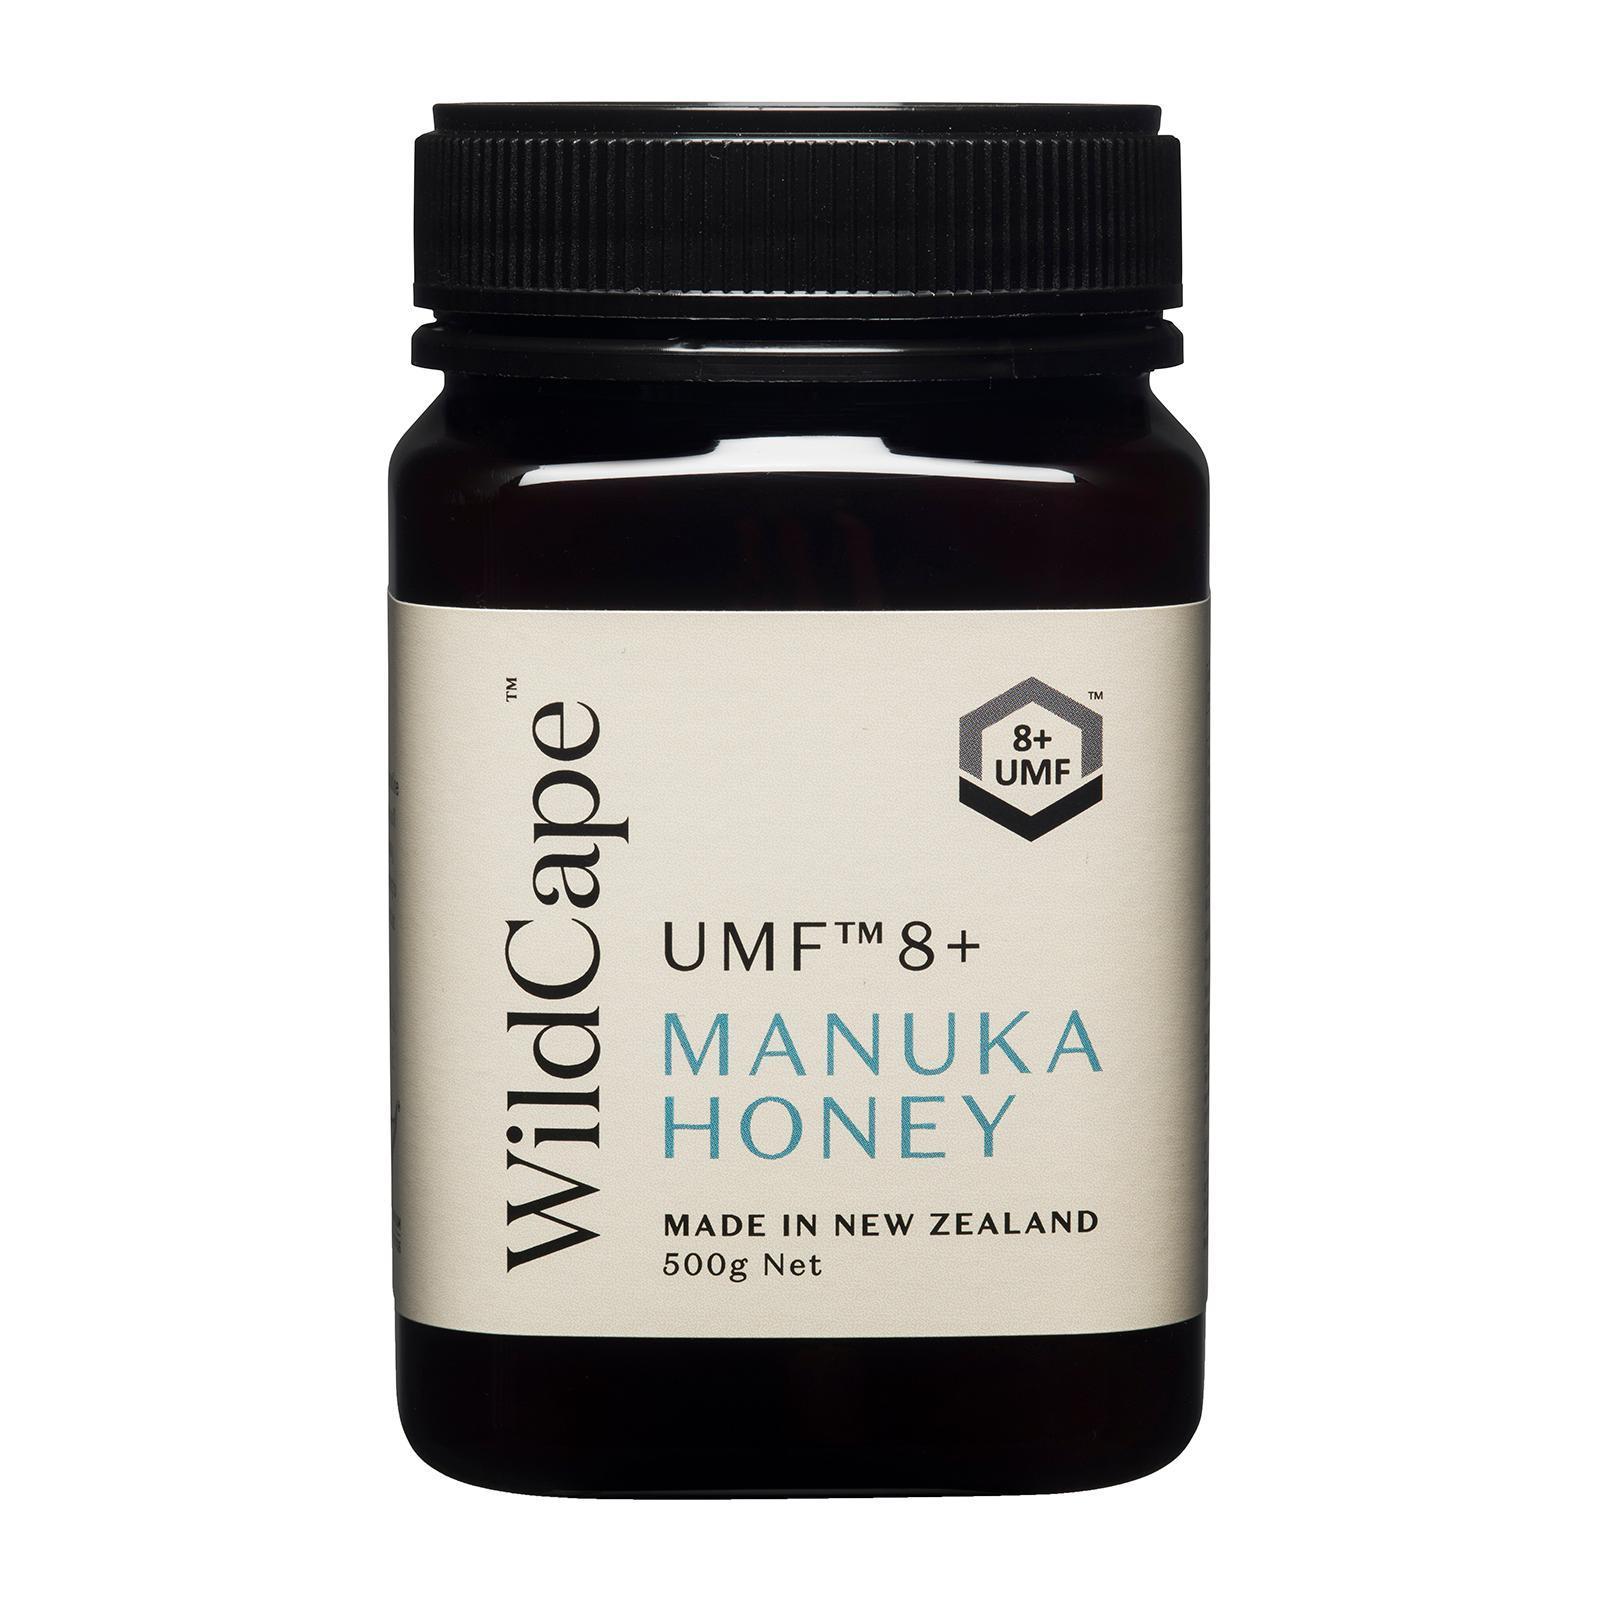 WildCape Manuka Honey UMF 8+ - By Nature's Nutrition